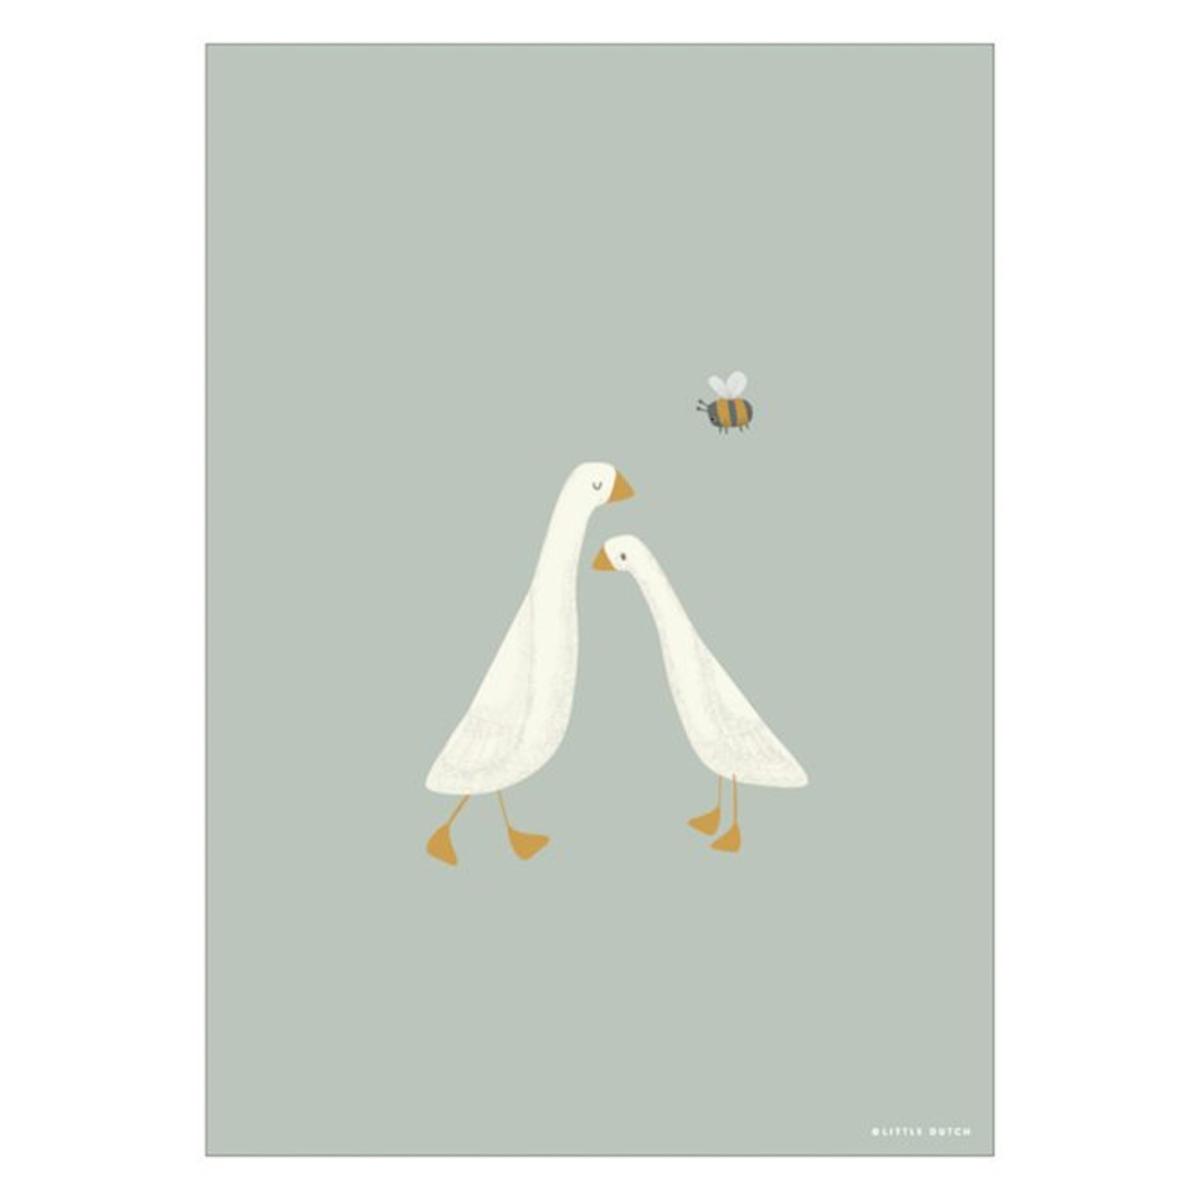 Affiche & poster Poster Réversible Little Goose - Little Goose Poster Réversible Little Goose - Little Goose